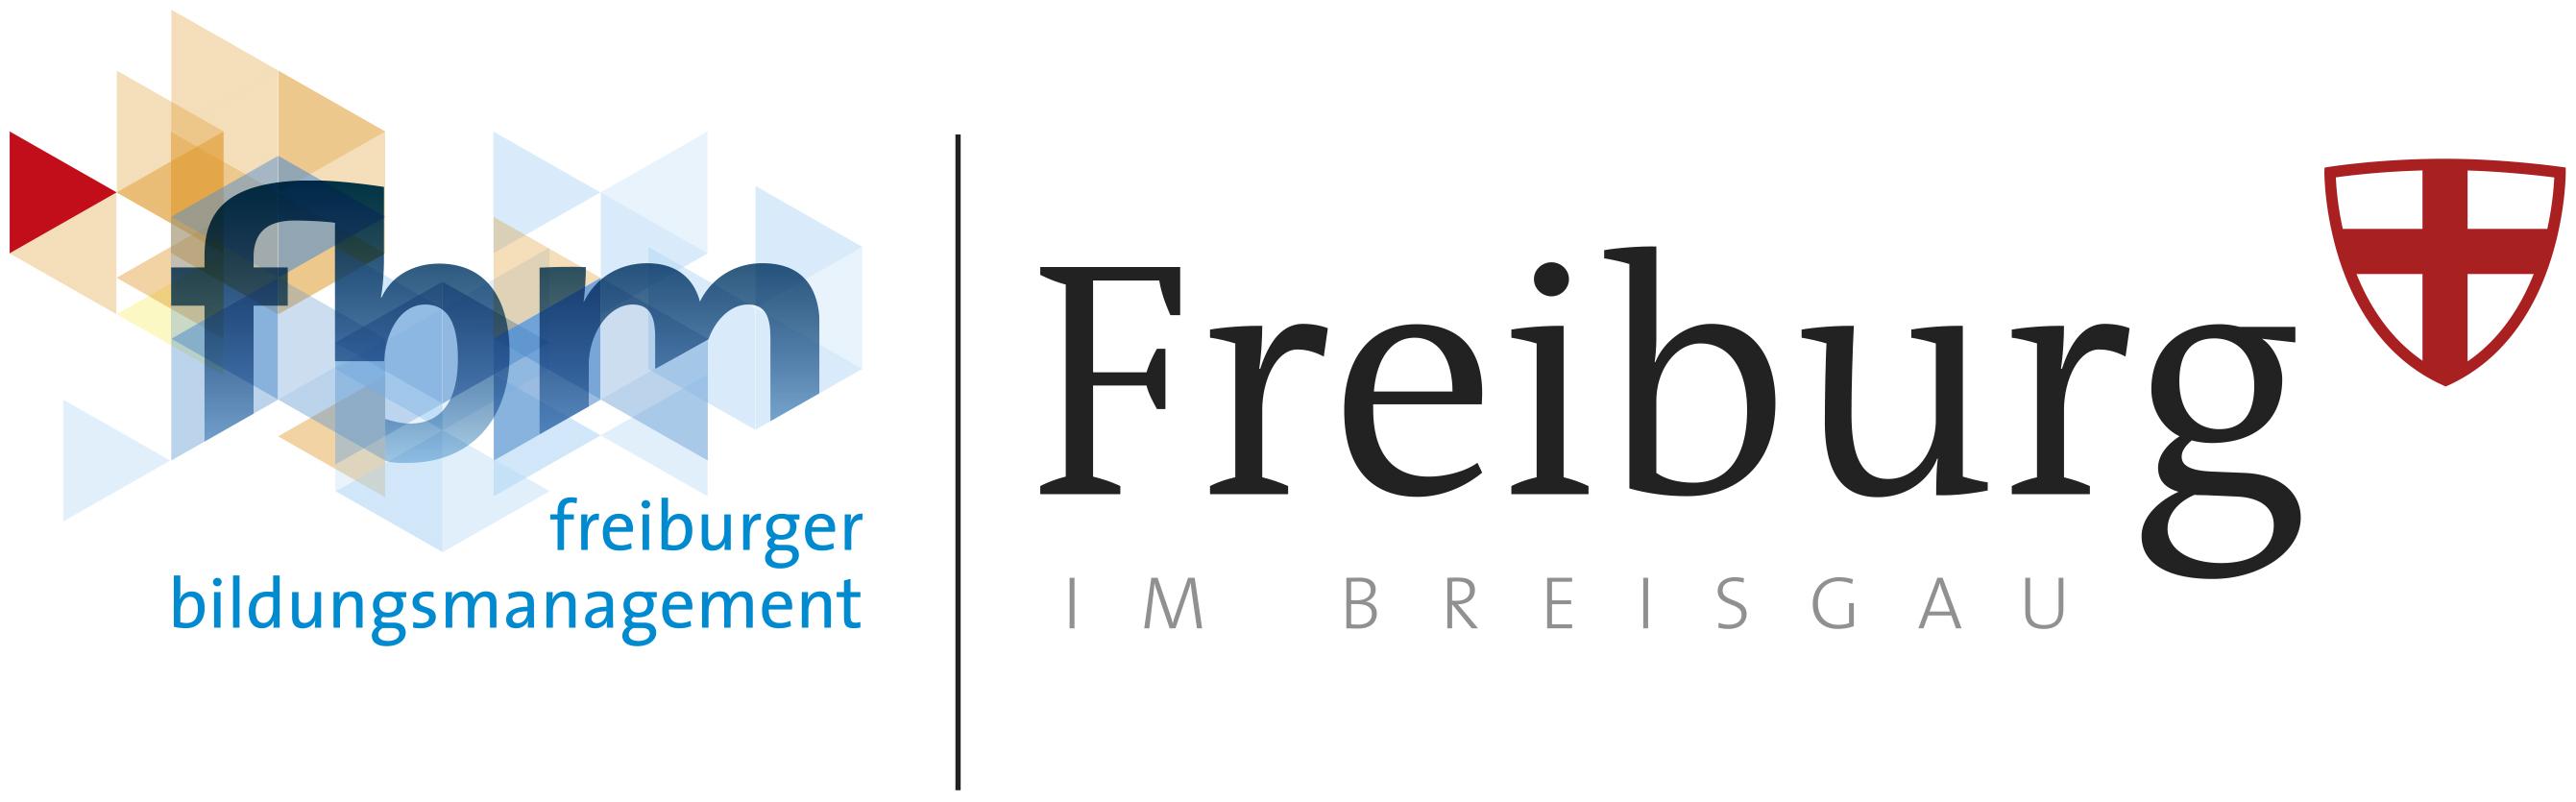 Freiburger Bildungsmanagement